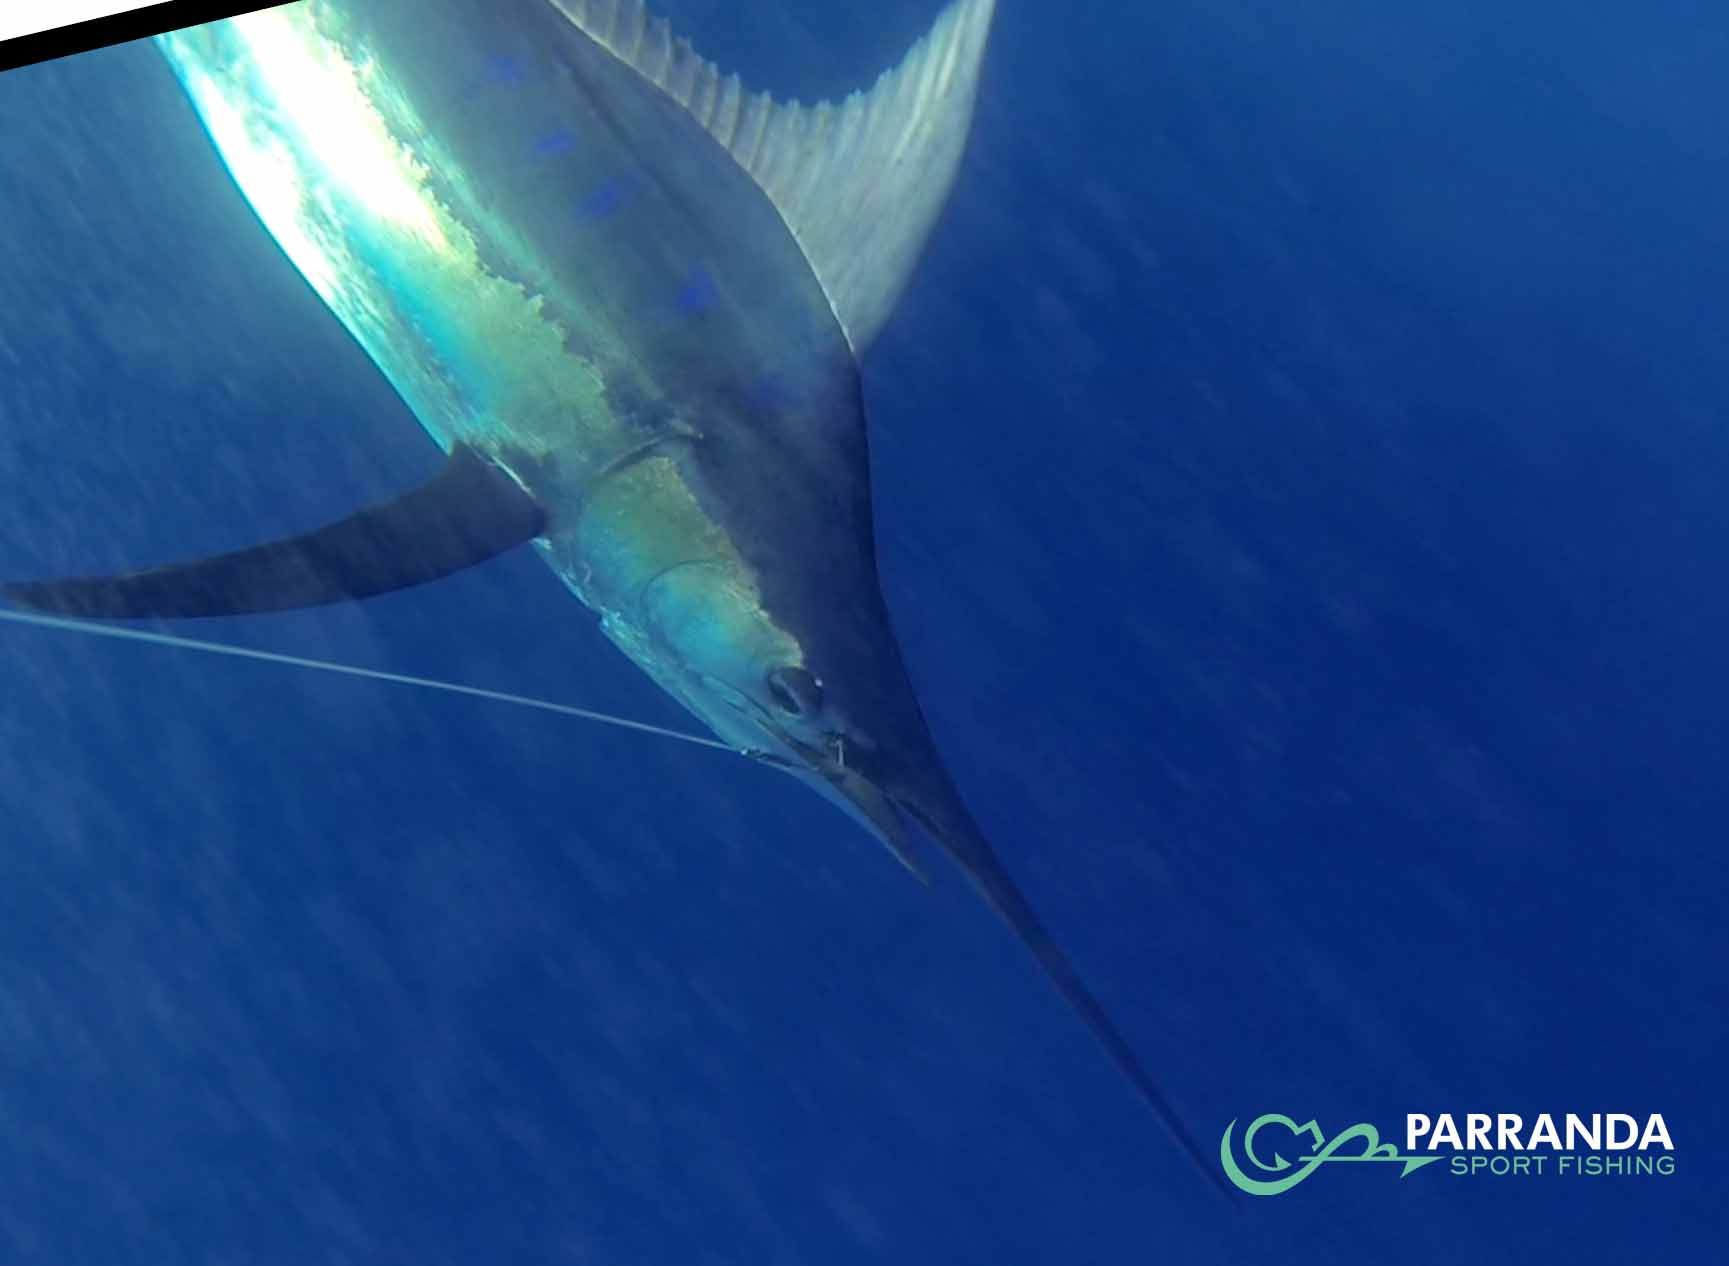 Parranda Sport Fishing